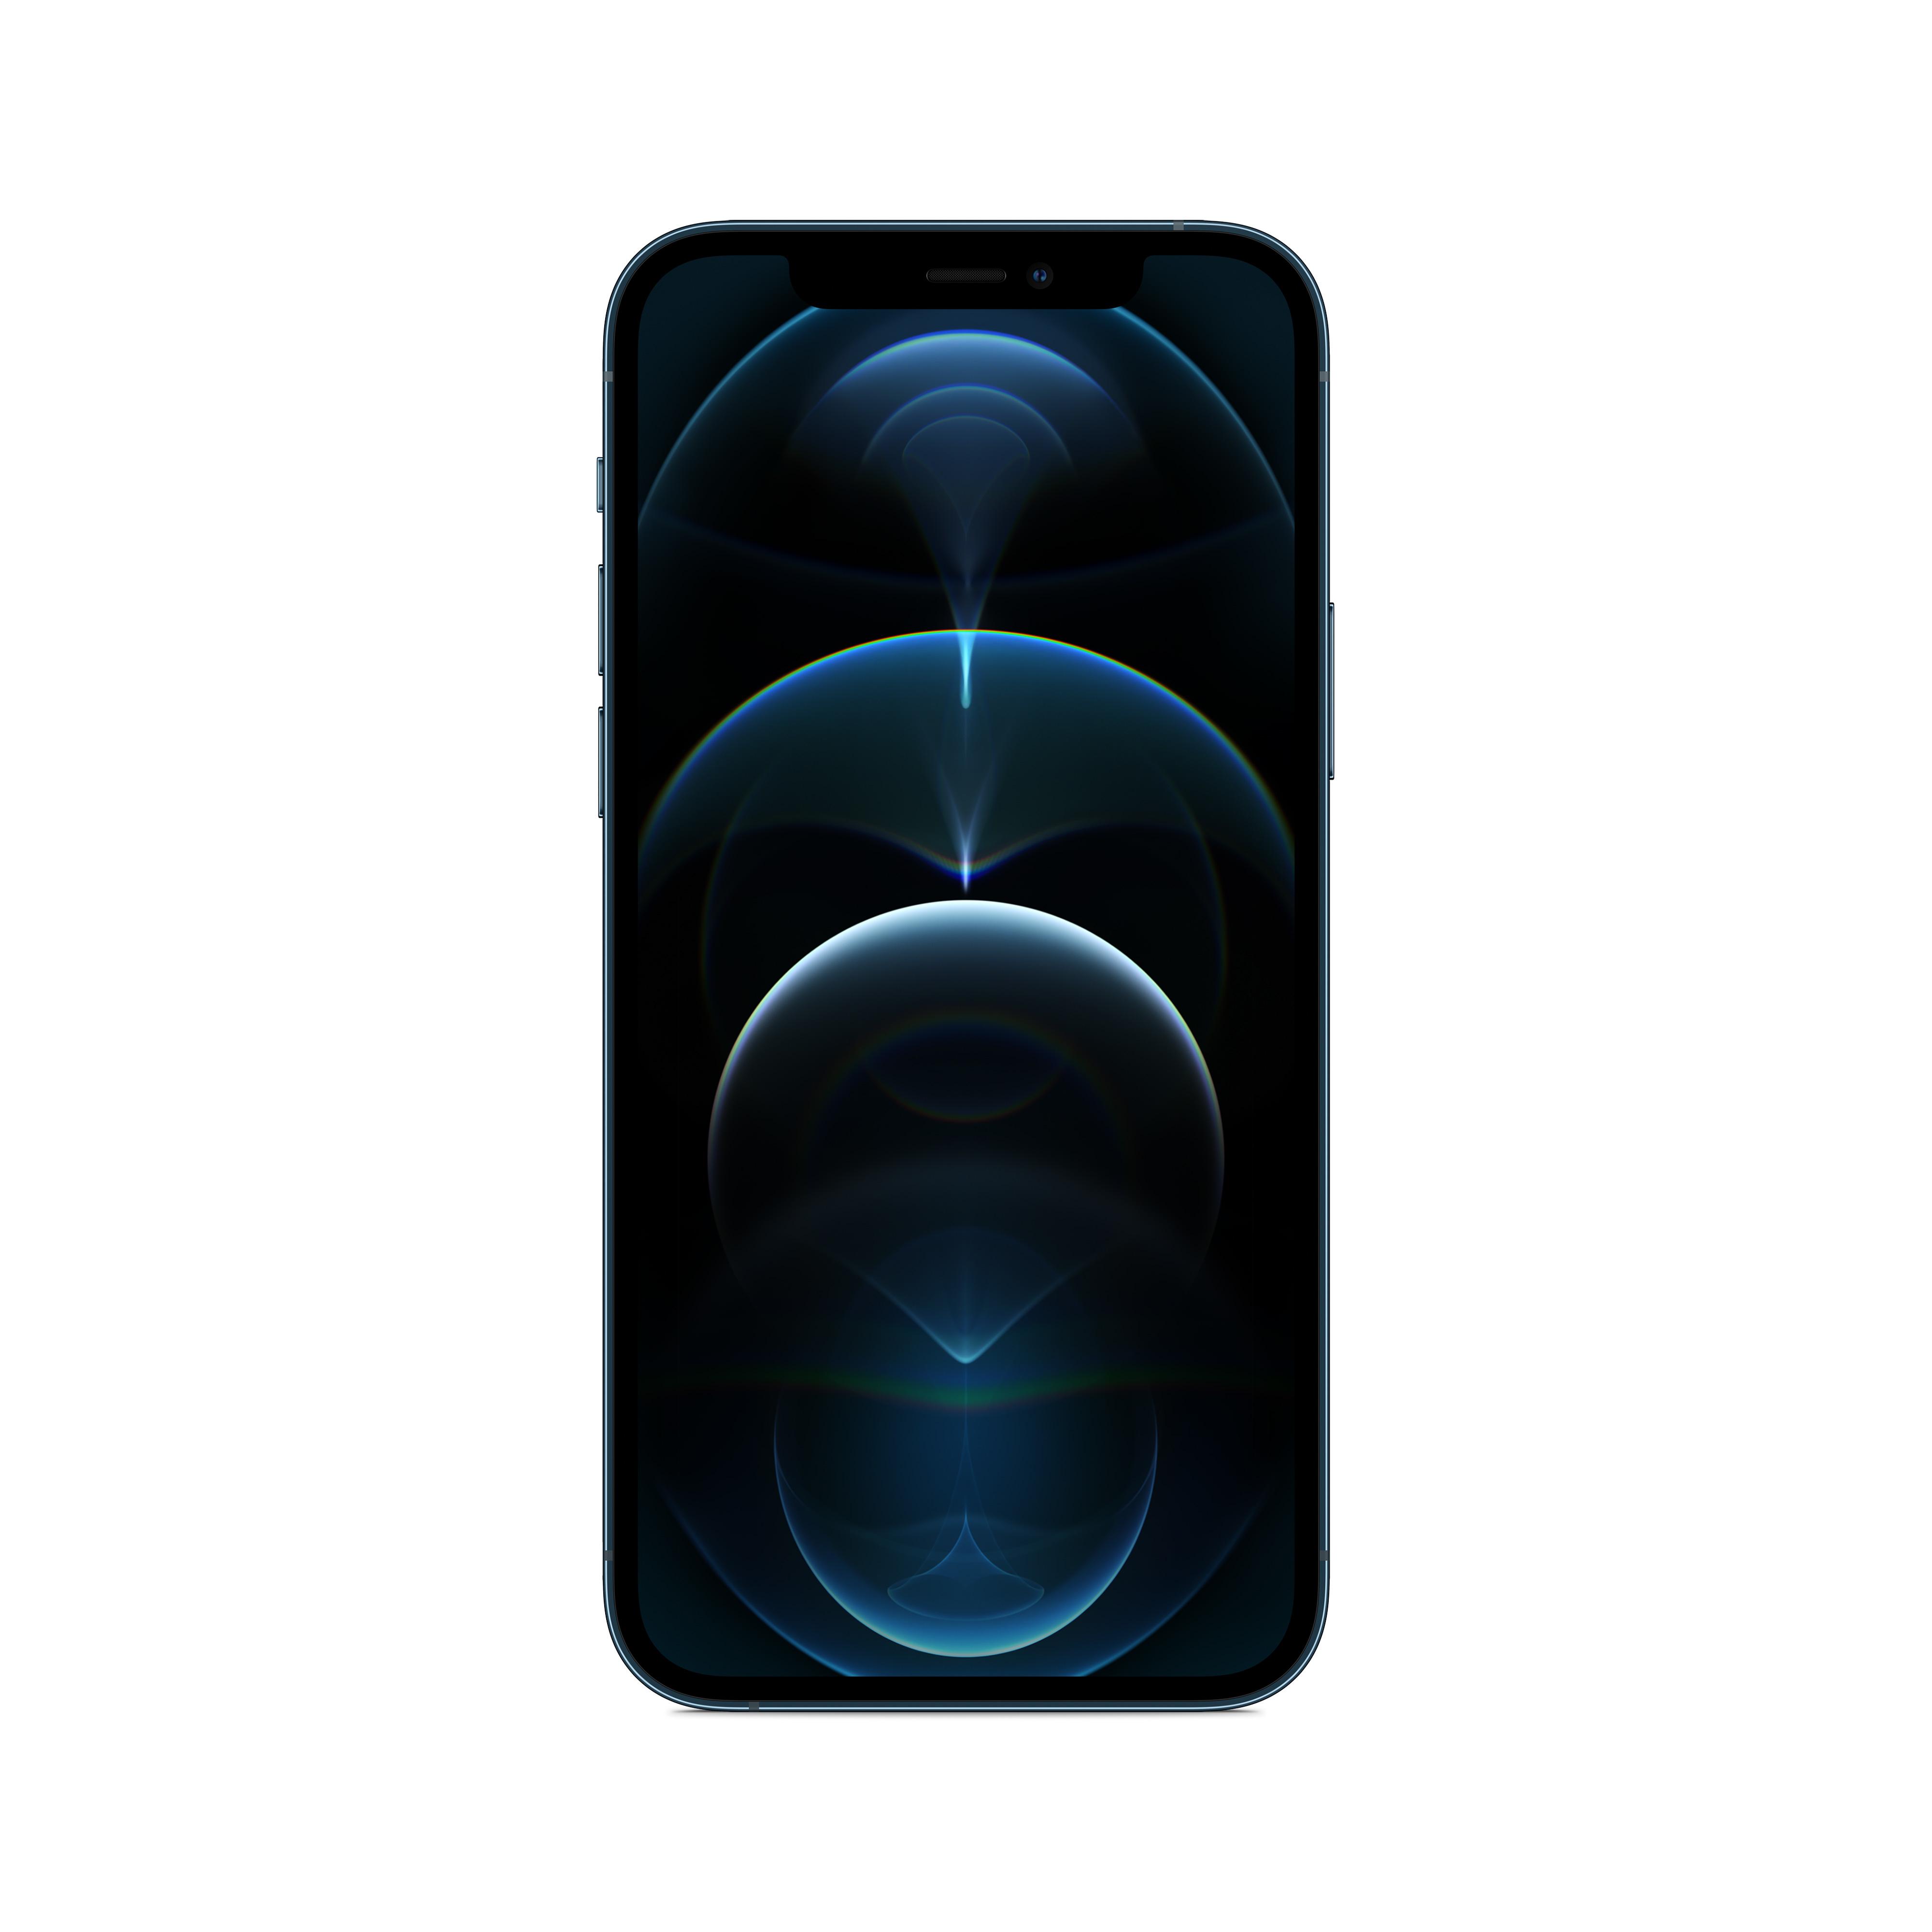 Apple - Iphone 12 Pro 256gb Pacific Blue